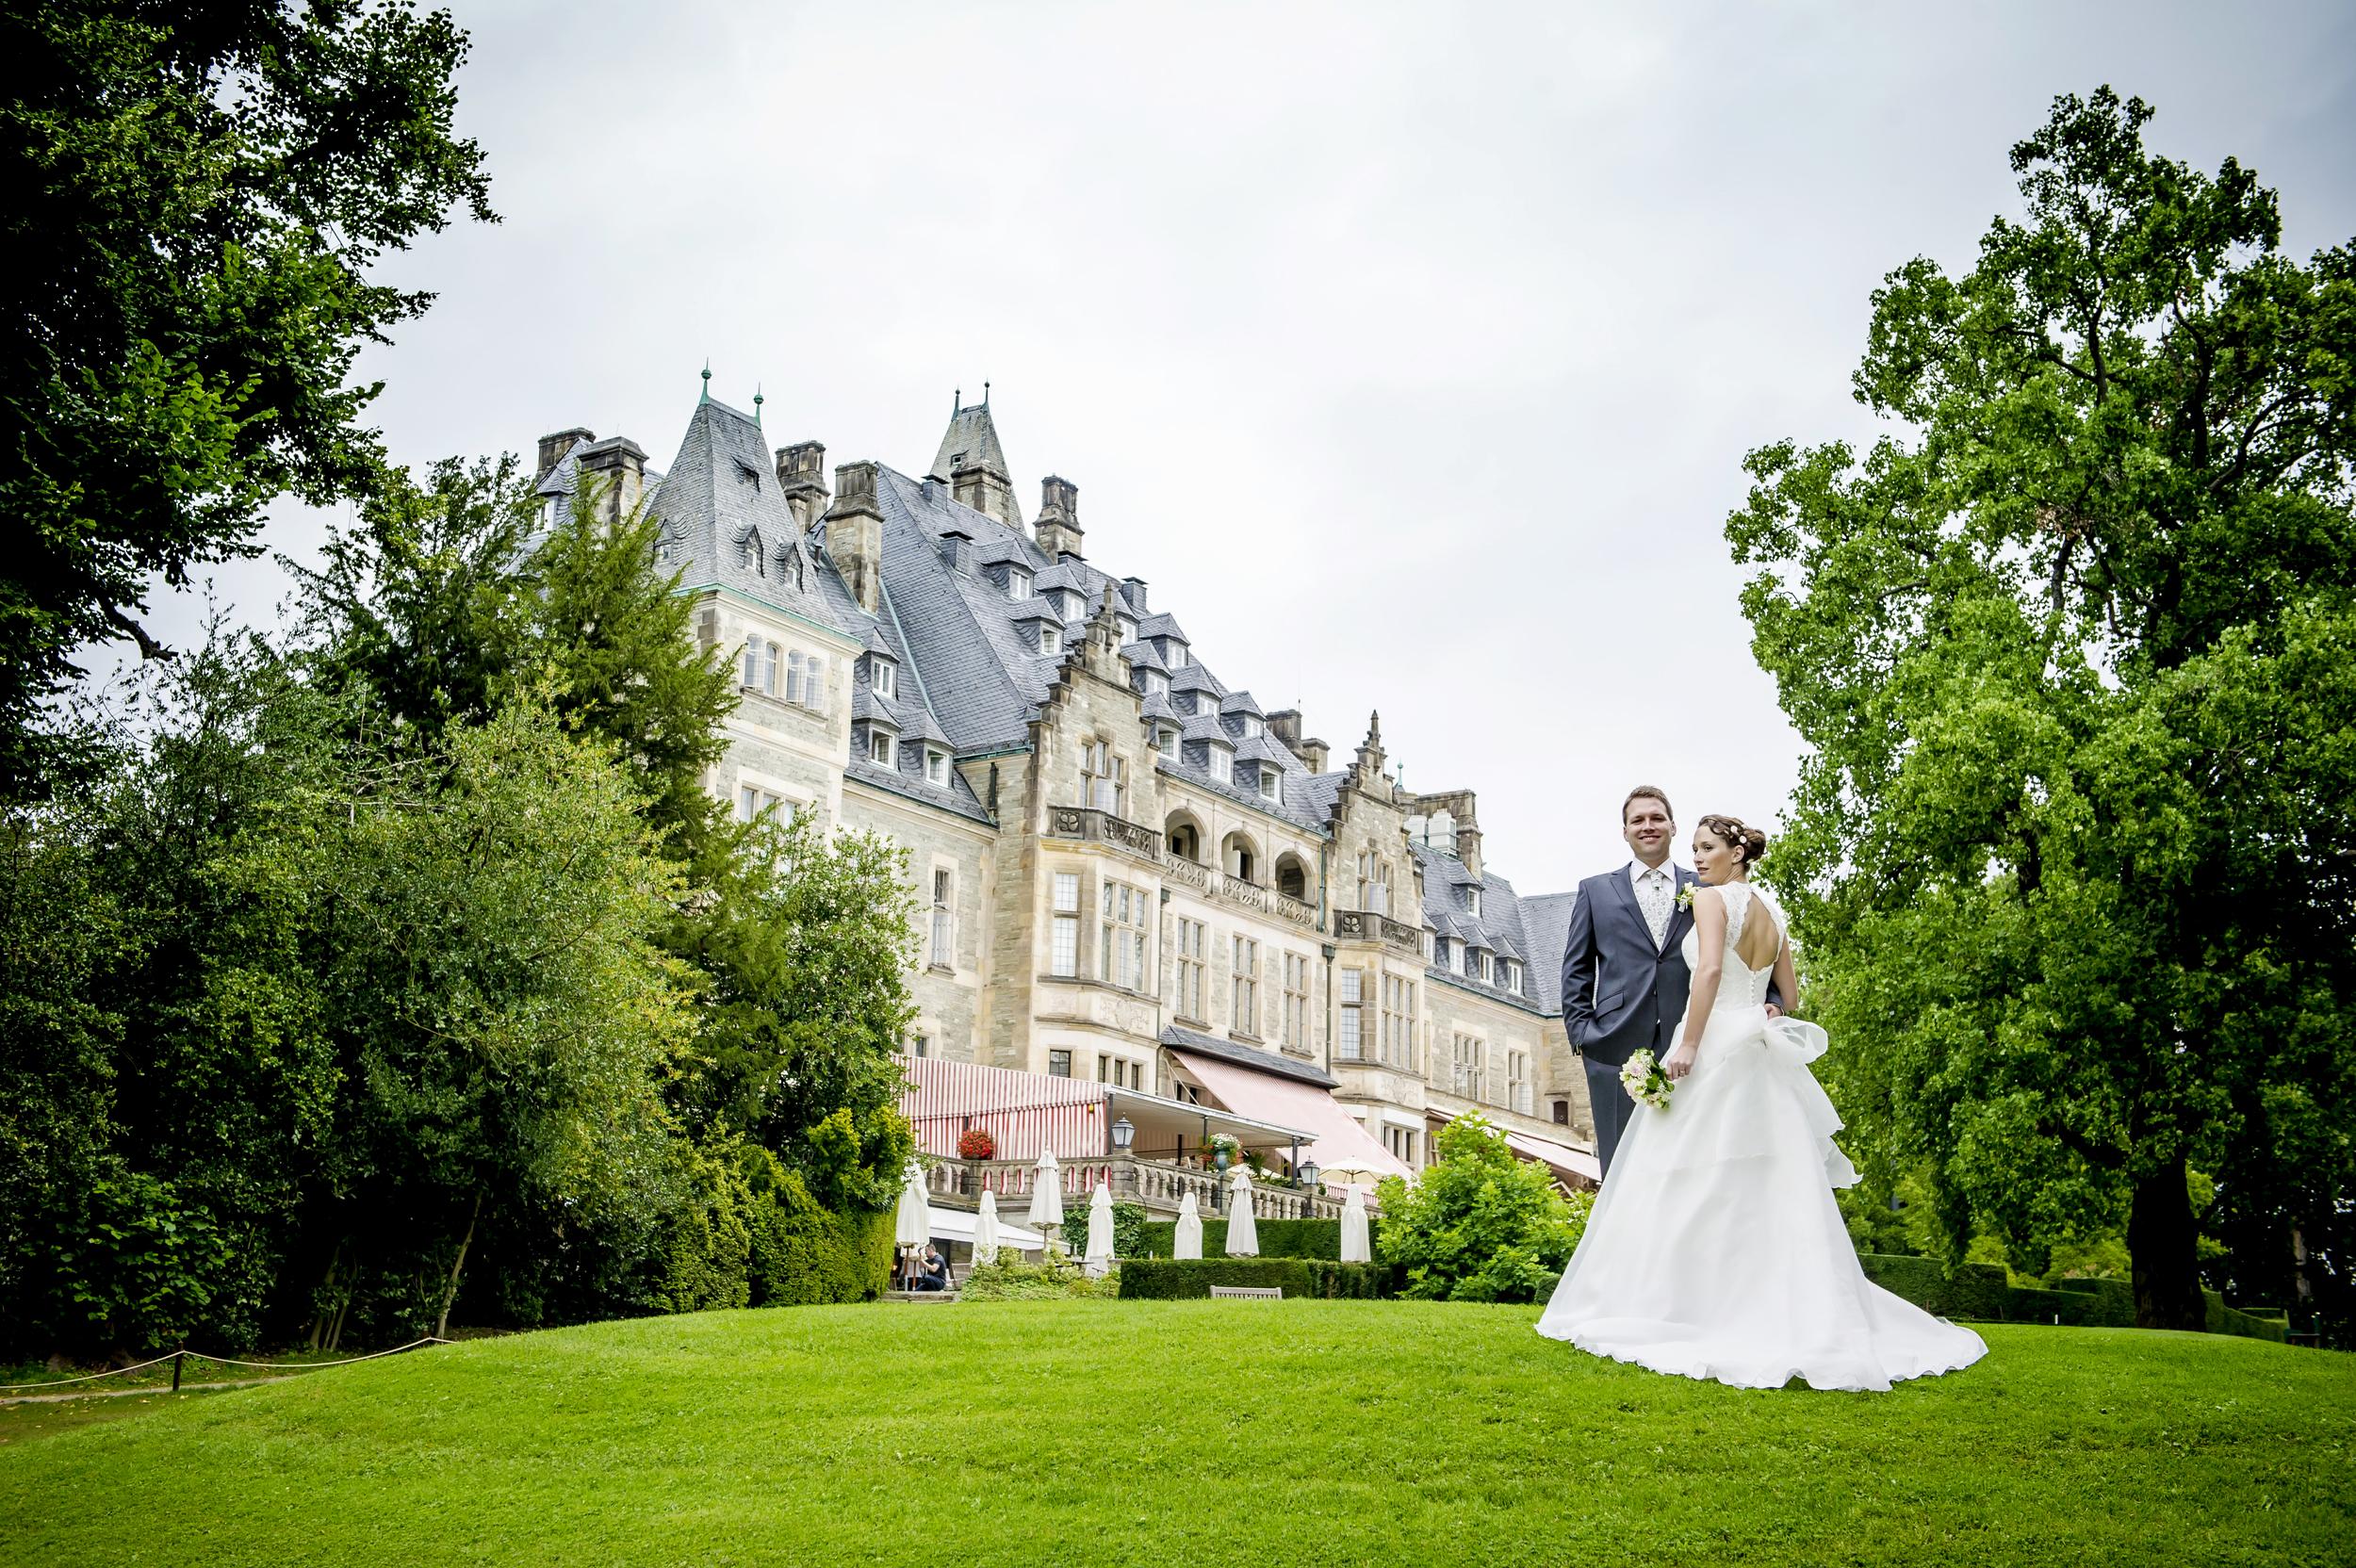 Schlosshotel Kronberg's domain